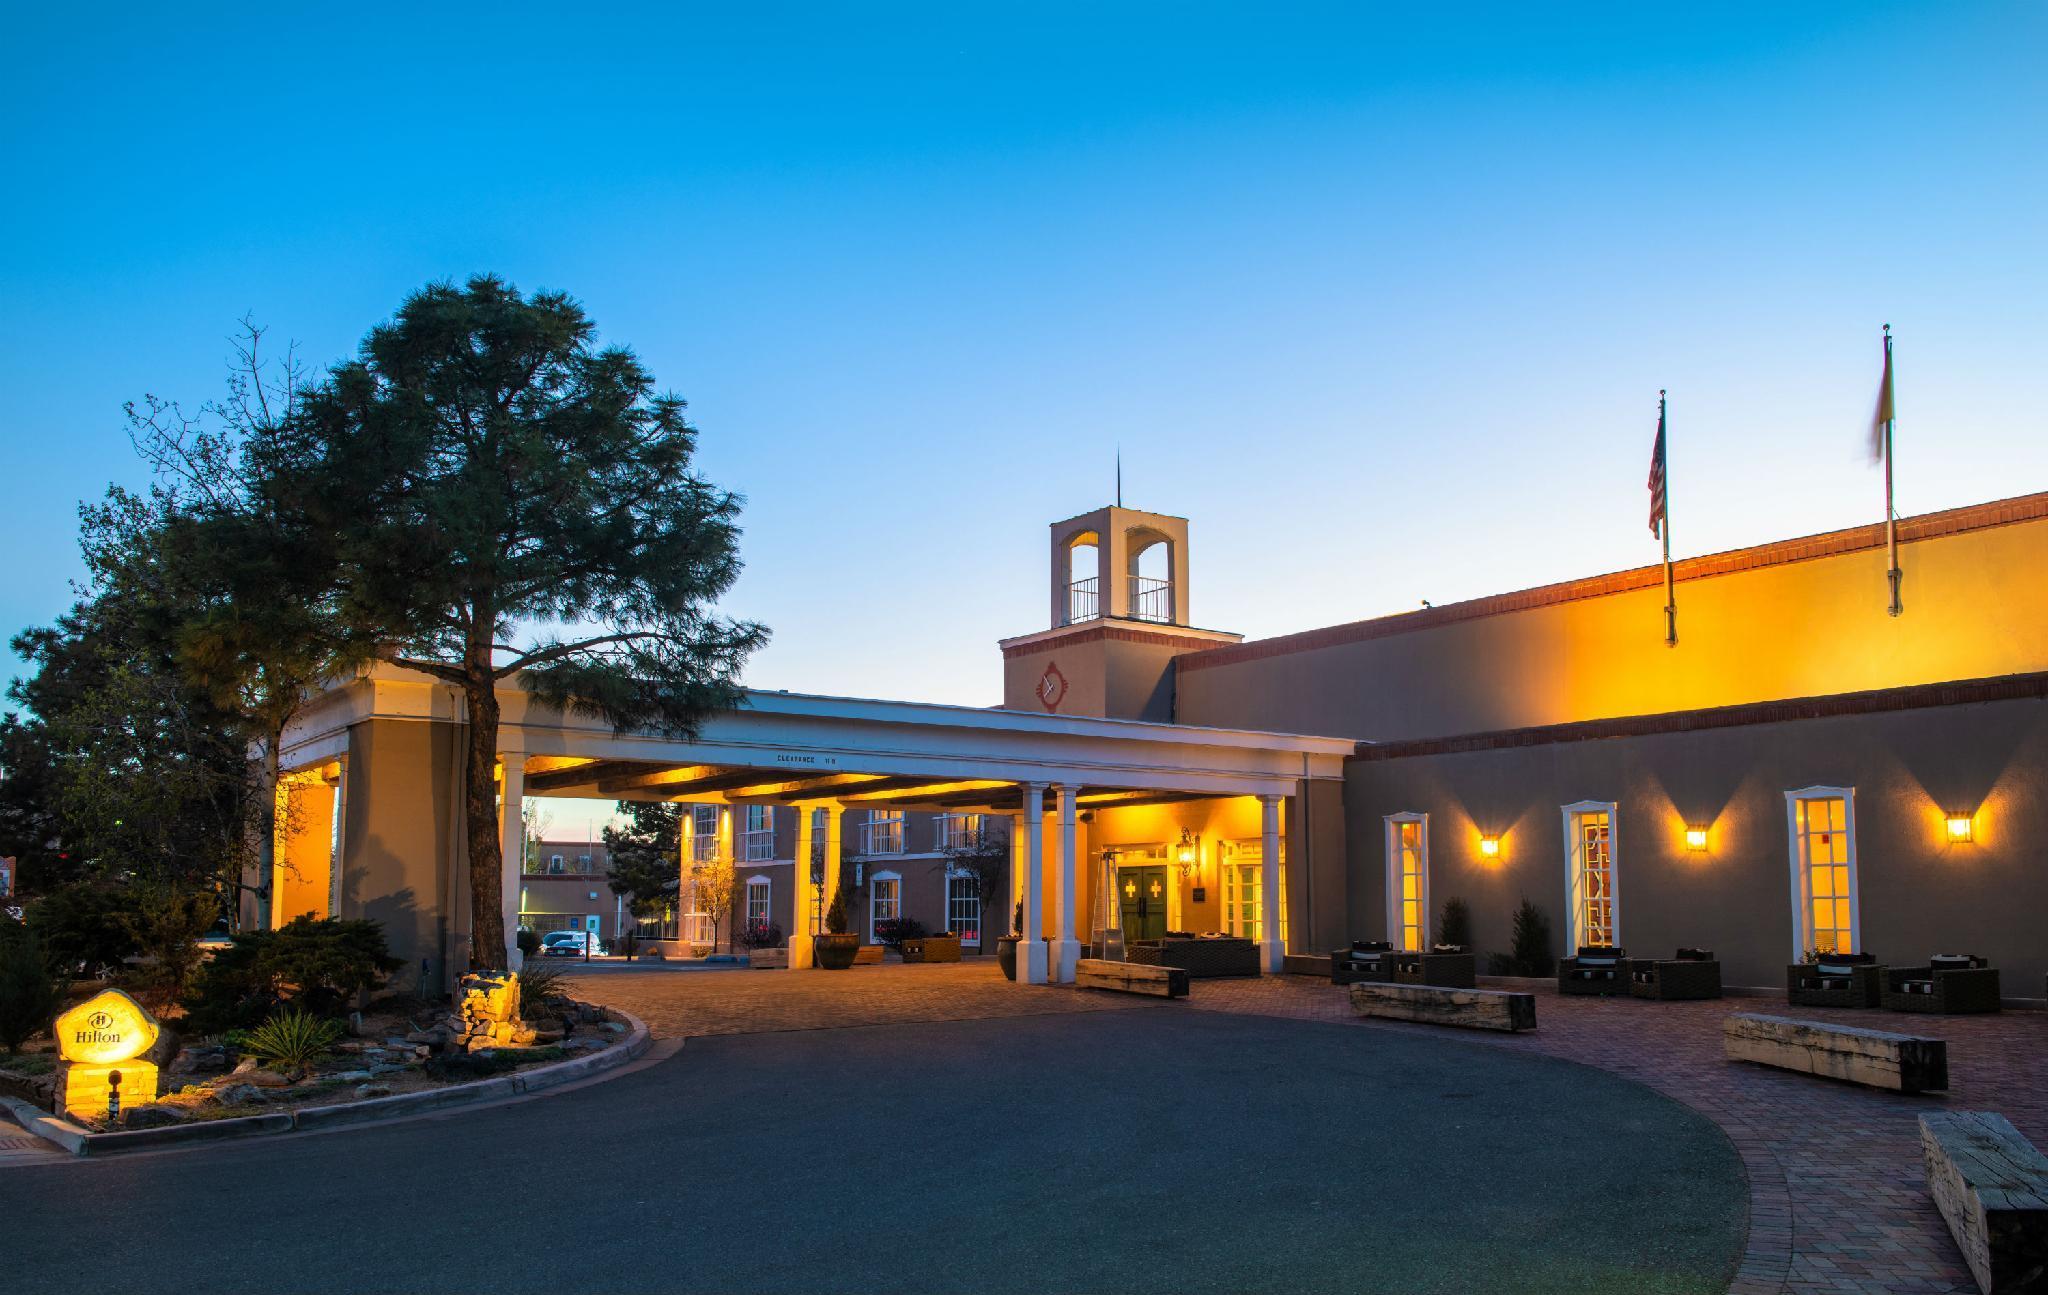 Hilton Santa Fe Historic Plaza Hotel